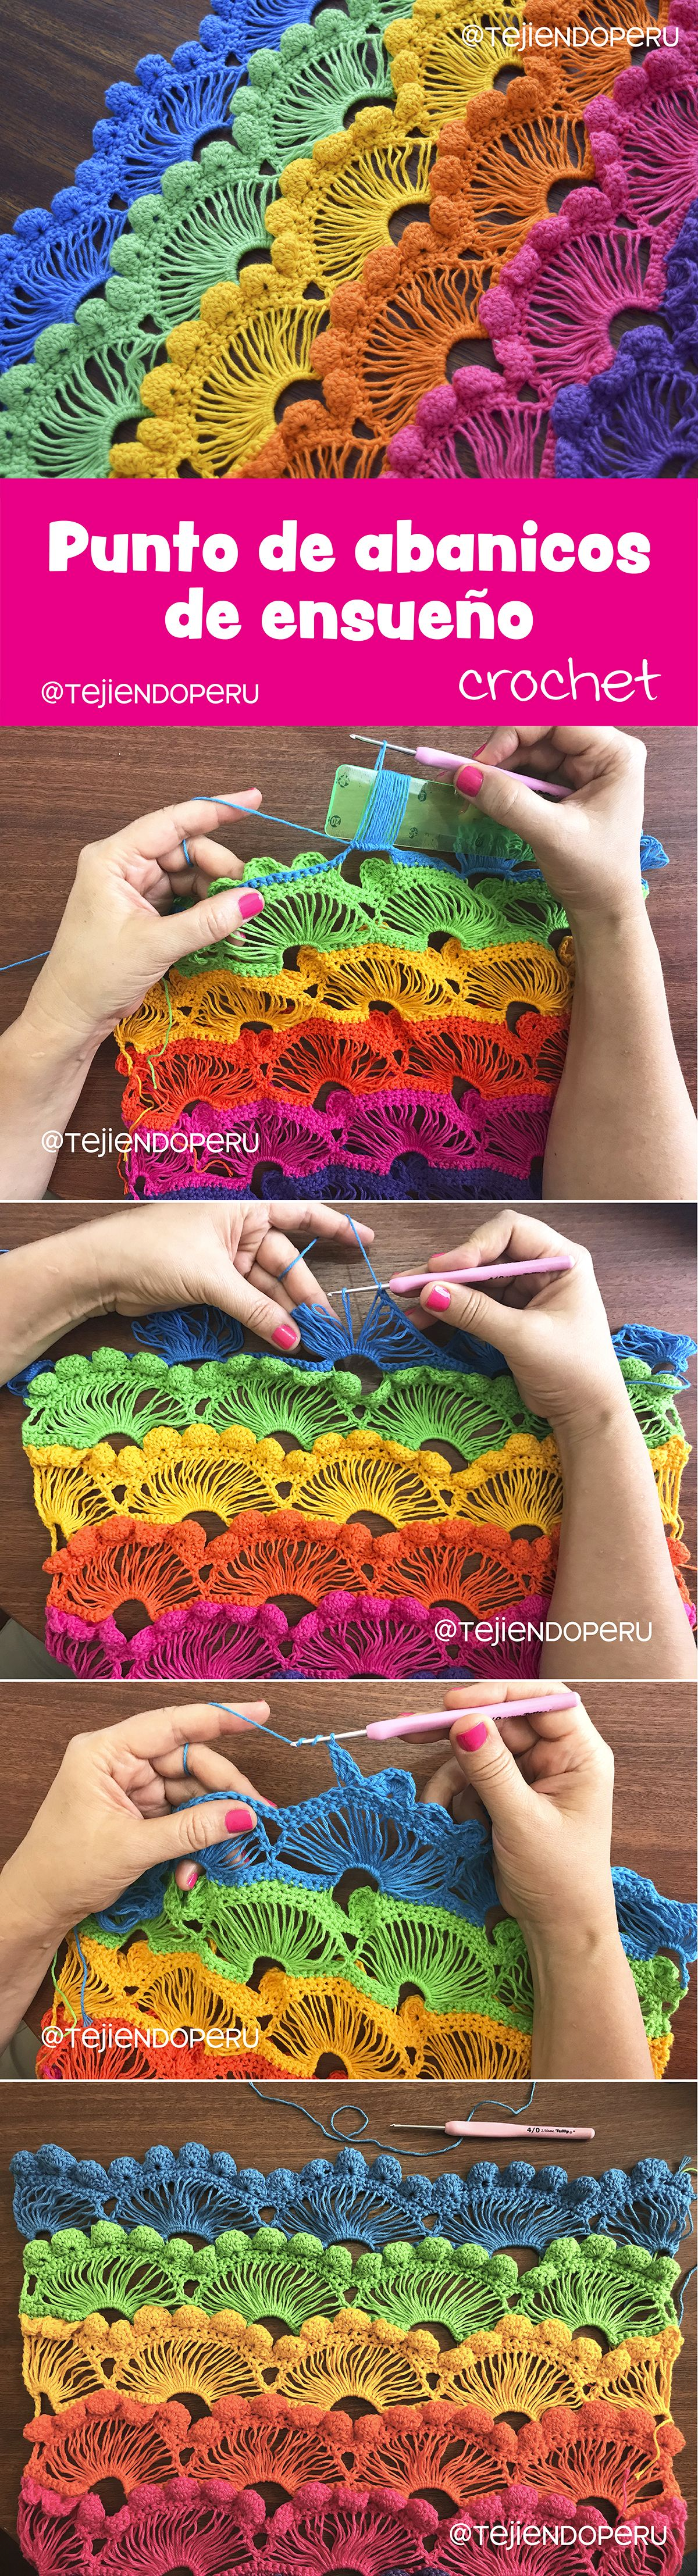 Punto de abanicos de ensueño tejido a crochet paso a paso... ¡fácil ...